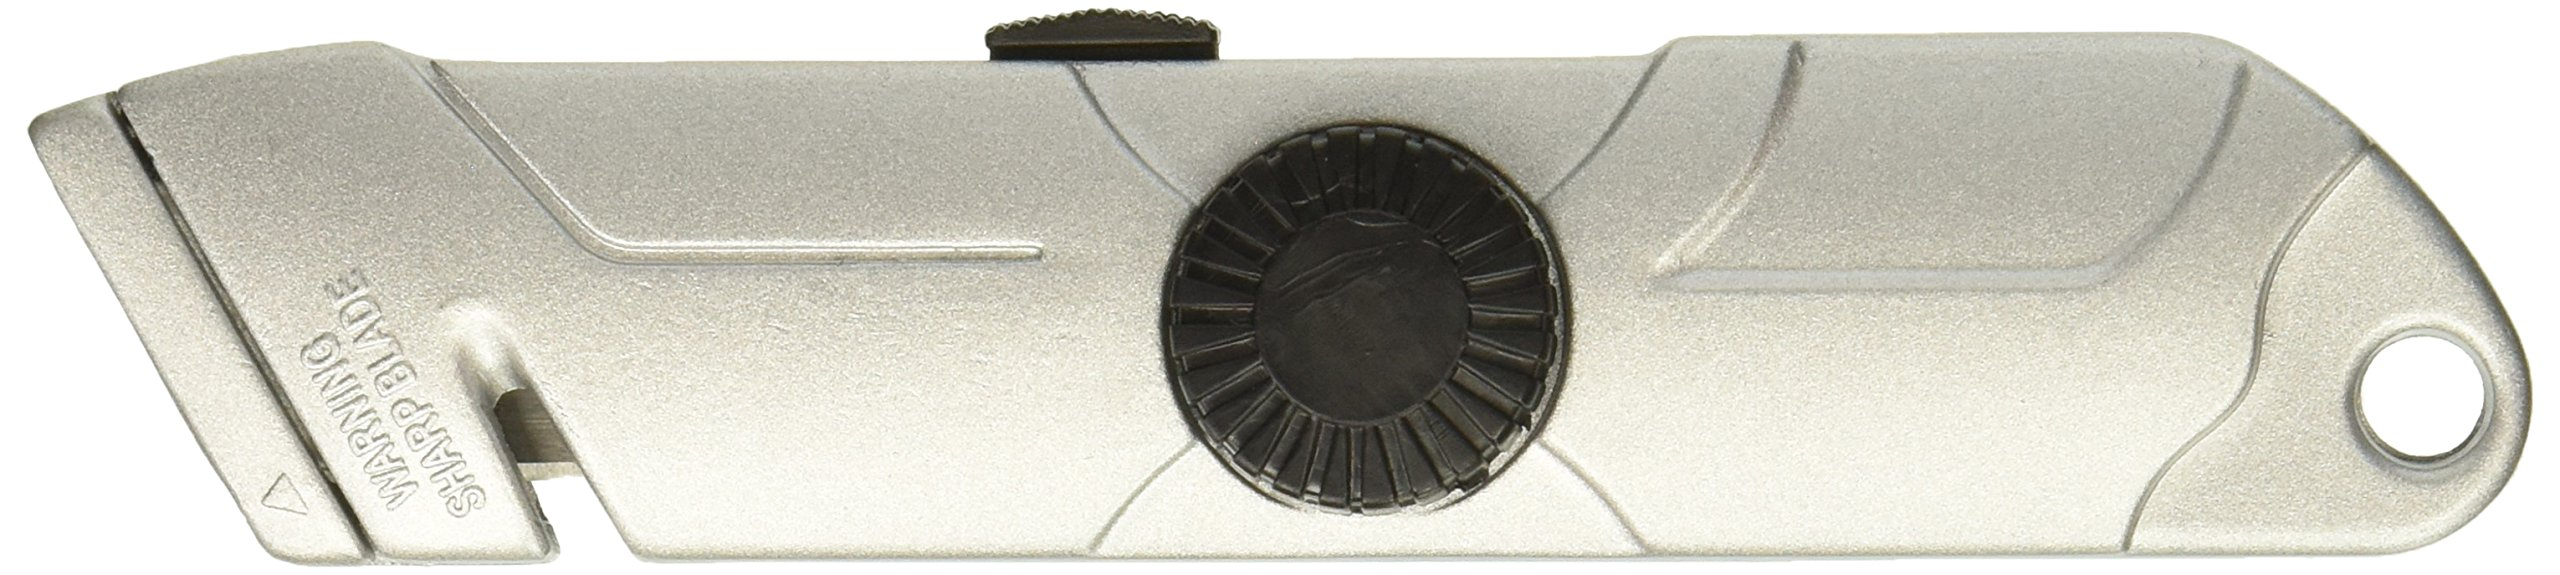 COSCO Auto Retractable Utility Knife (COS091479)